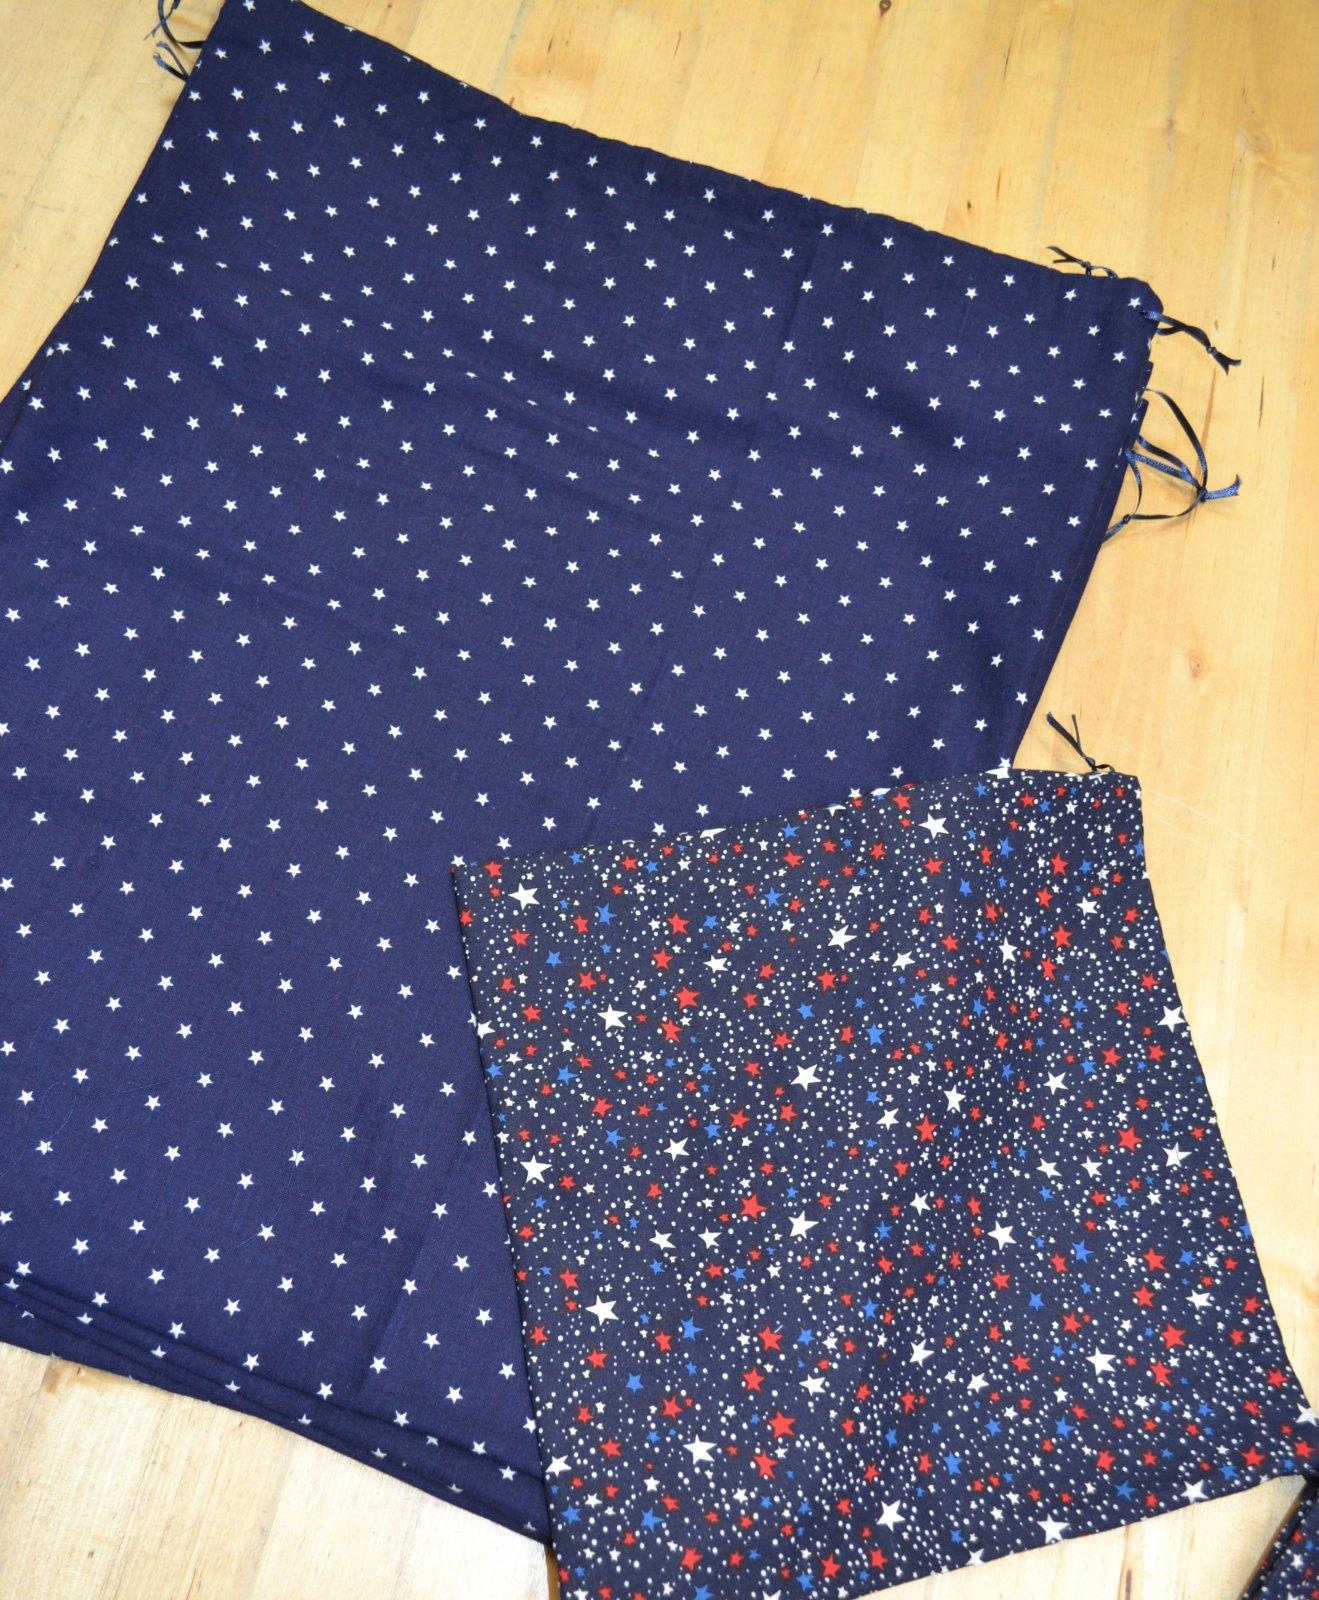 Silvan Drawstring Bags